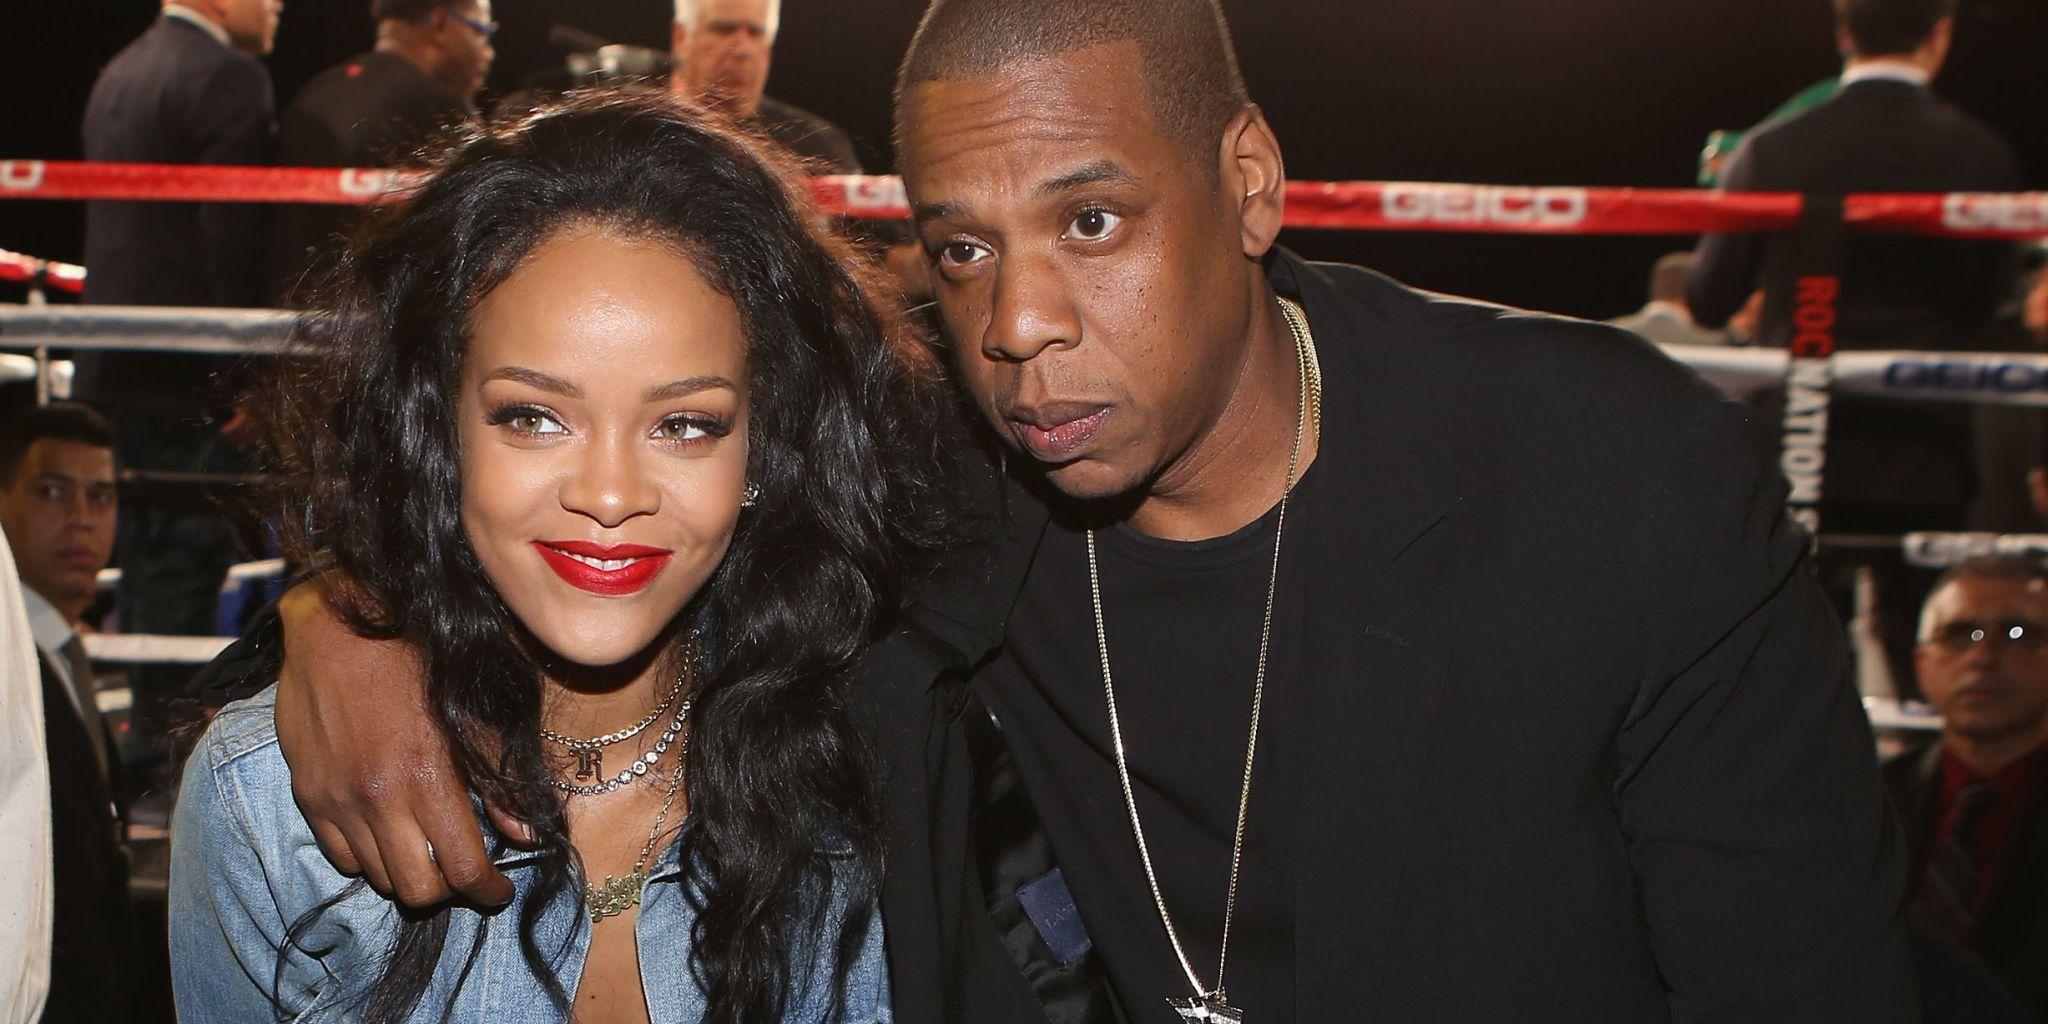 Rihanna and jay z dating rumors